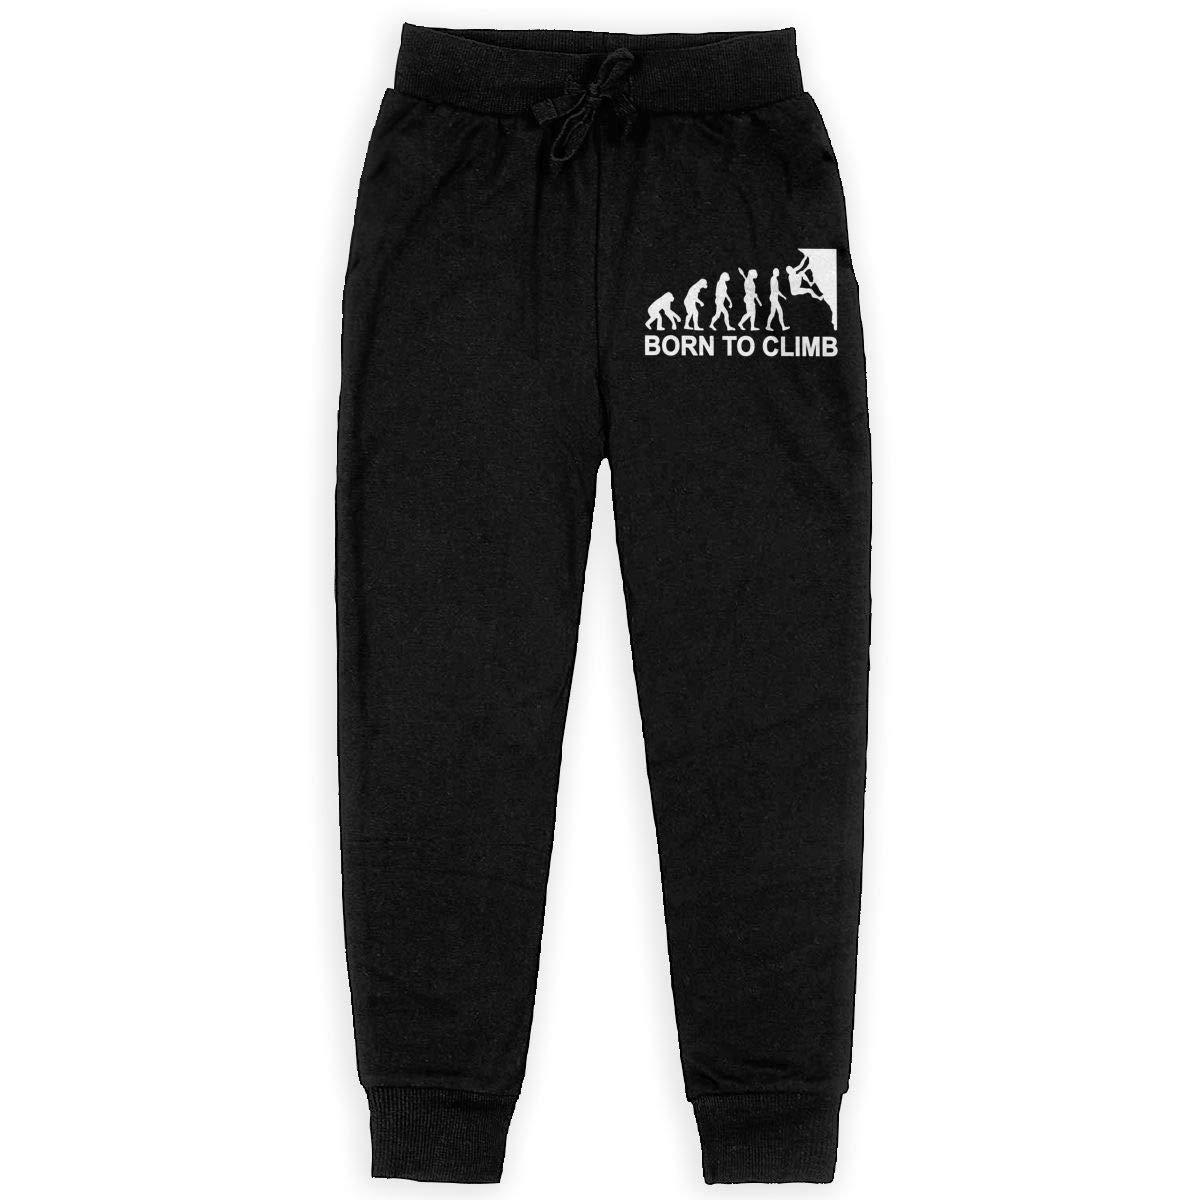 WYZVK22 Evolution Climbing Soft//Cozy Sweatpants Teenager Warm Fleece Active Pants Teen Boy